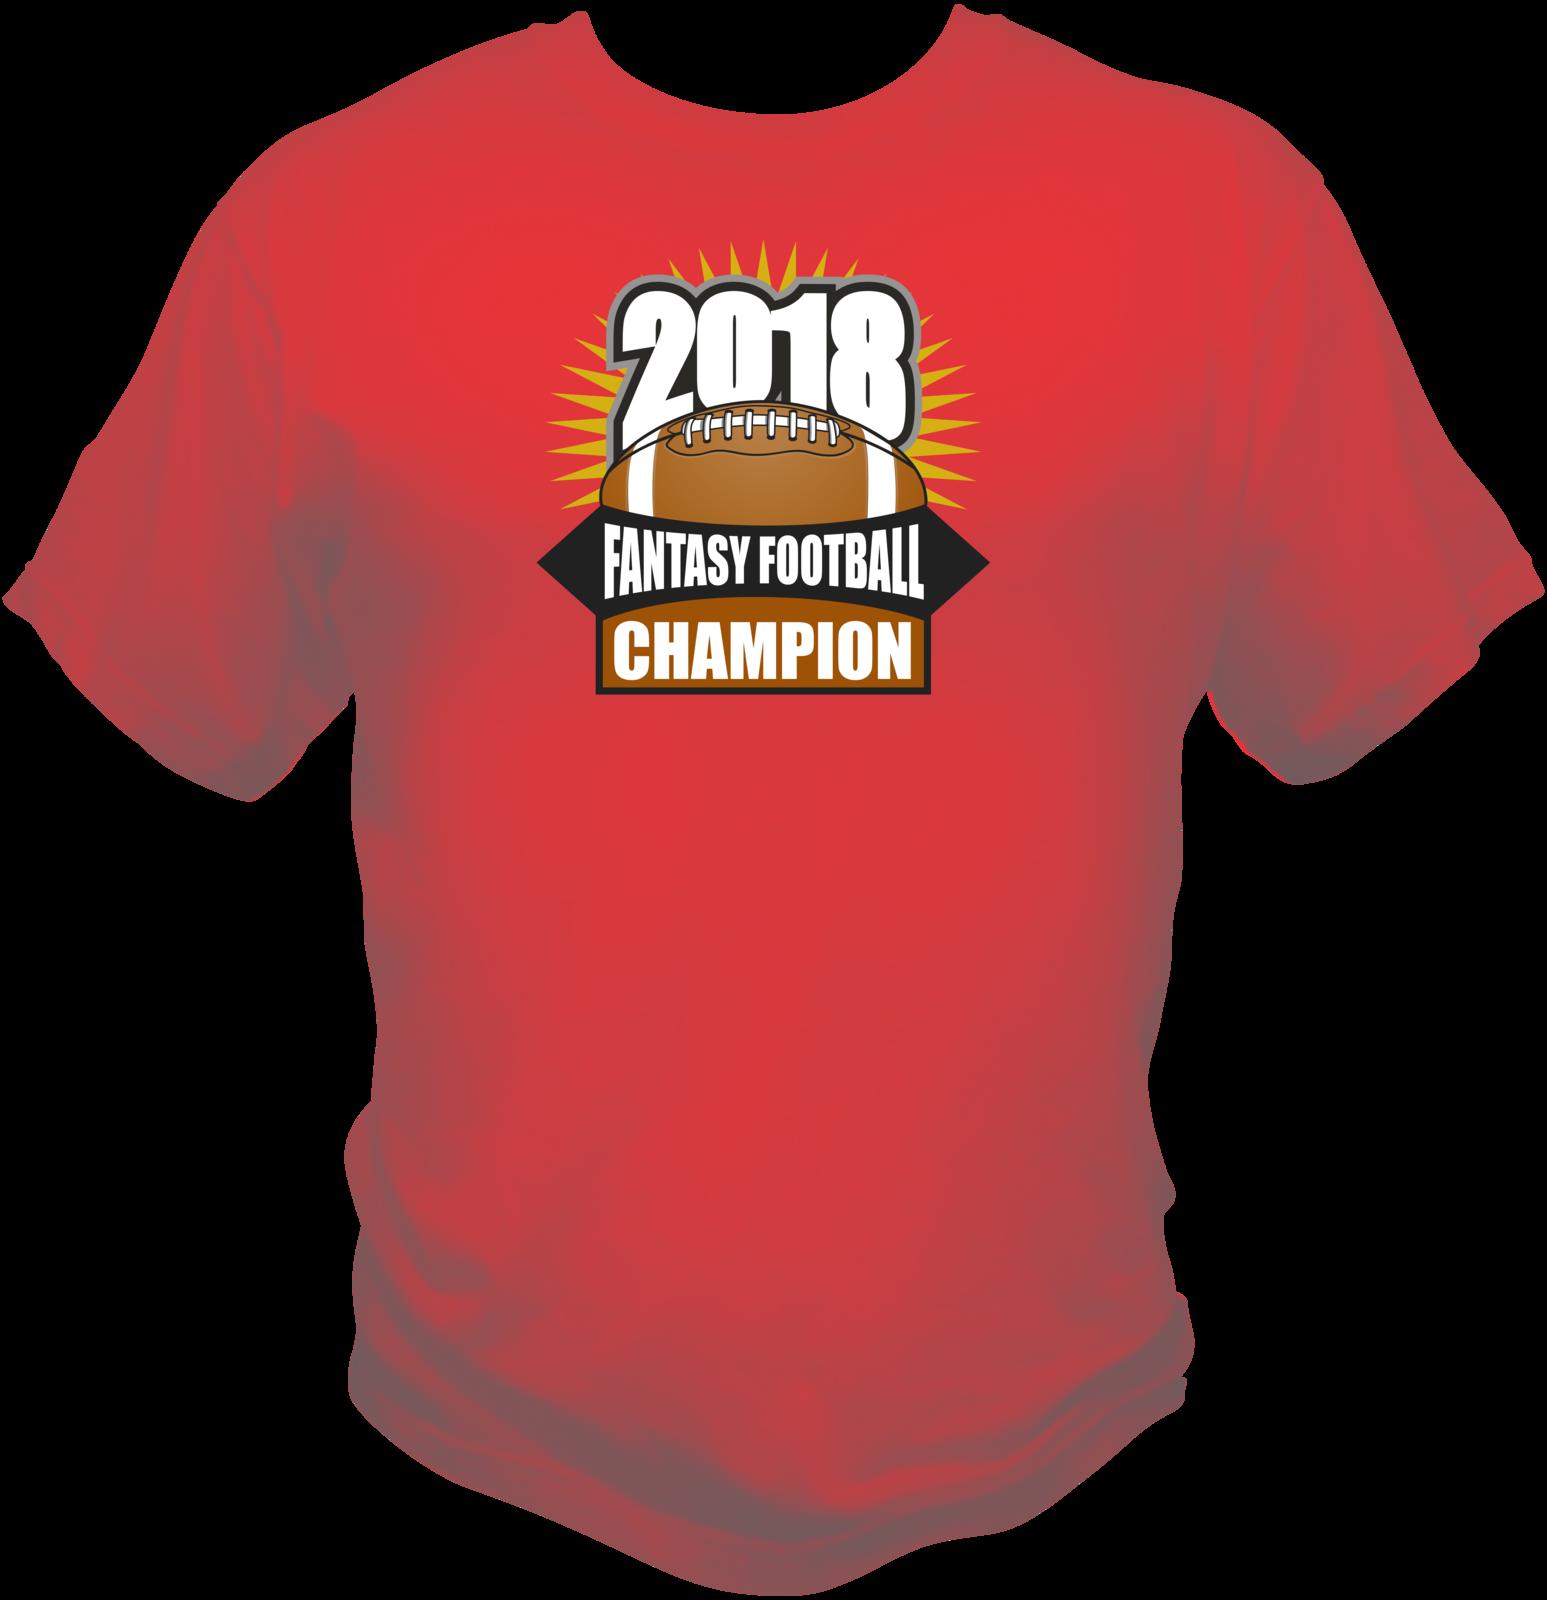 Fantasy Football Champion 2018 Themed Mens Graphic Sports Style T Shirt L XL 2X